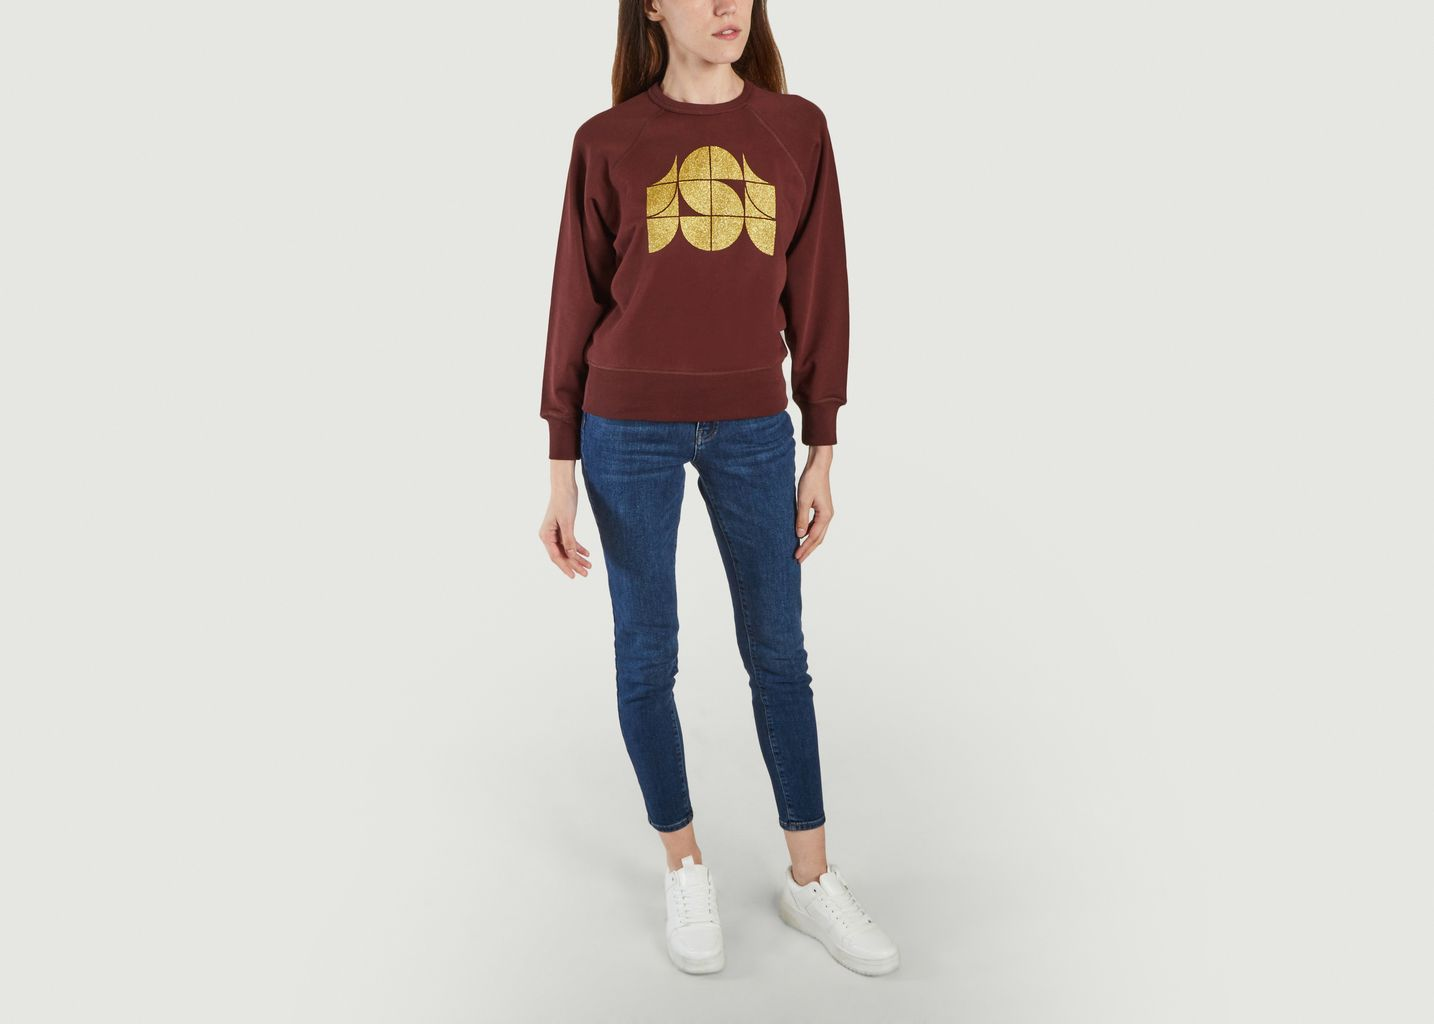 Sweatshirt Hendrix Aubergine  - Soeur